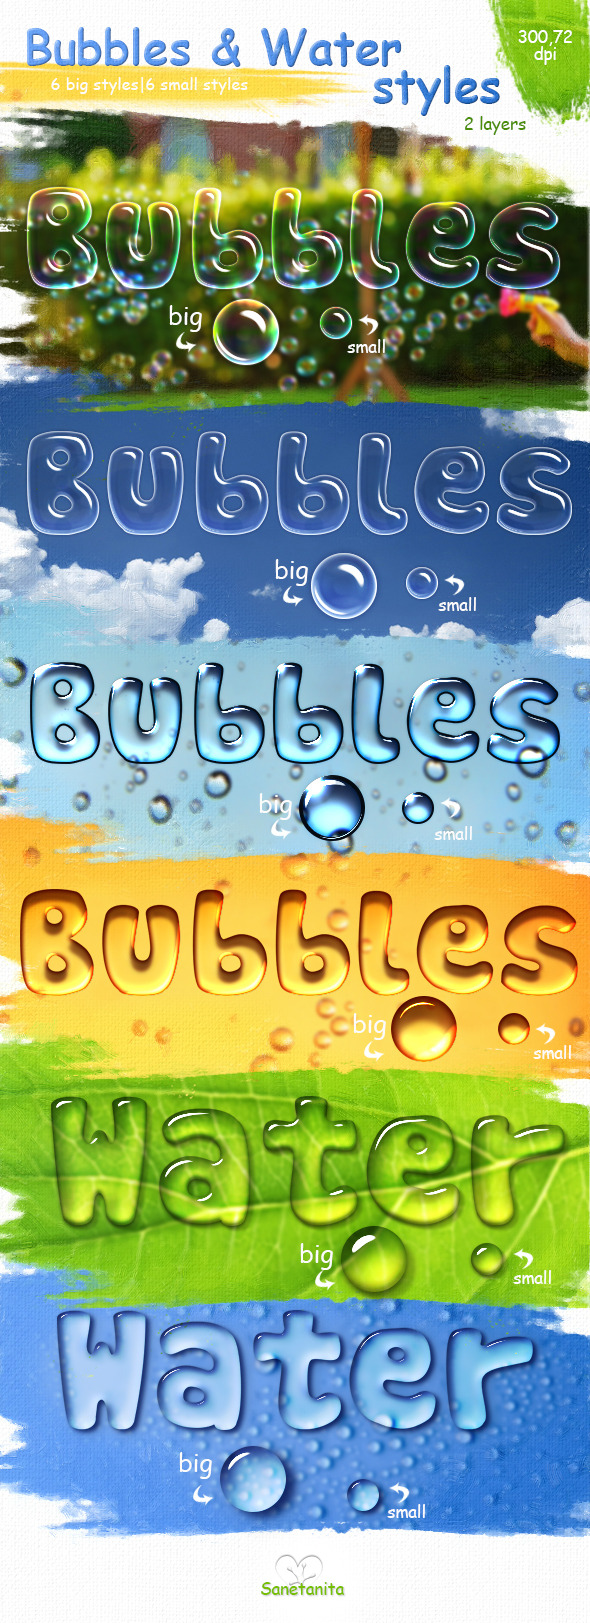 Bubbles & Water Styles